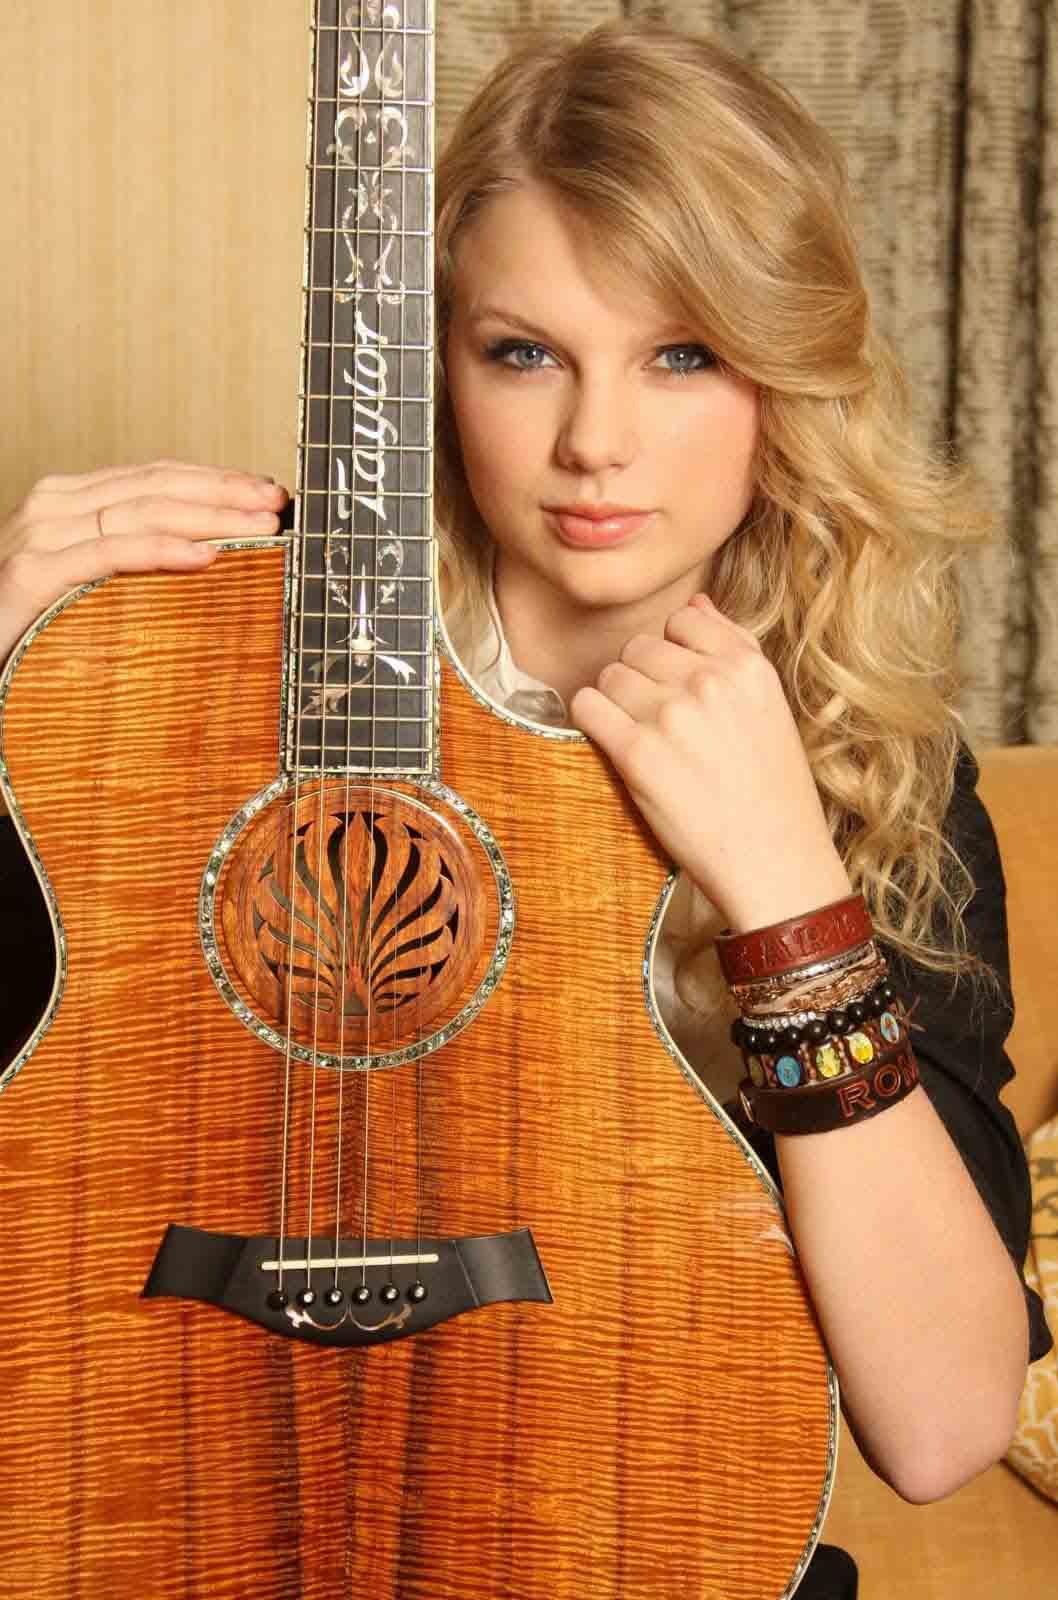 http://4.bp.blogspot.com/-nePnAa0Xvfs/UIVjv9jqO0I/AAAAAAAABKk/-UE6NZphf_w/s1600/18694_taylor+swift+with+guitar+copy.jpg